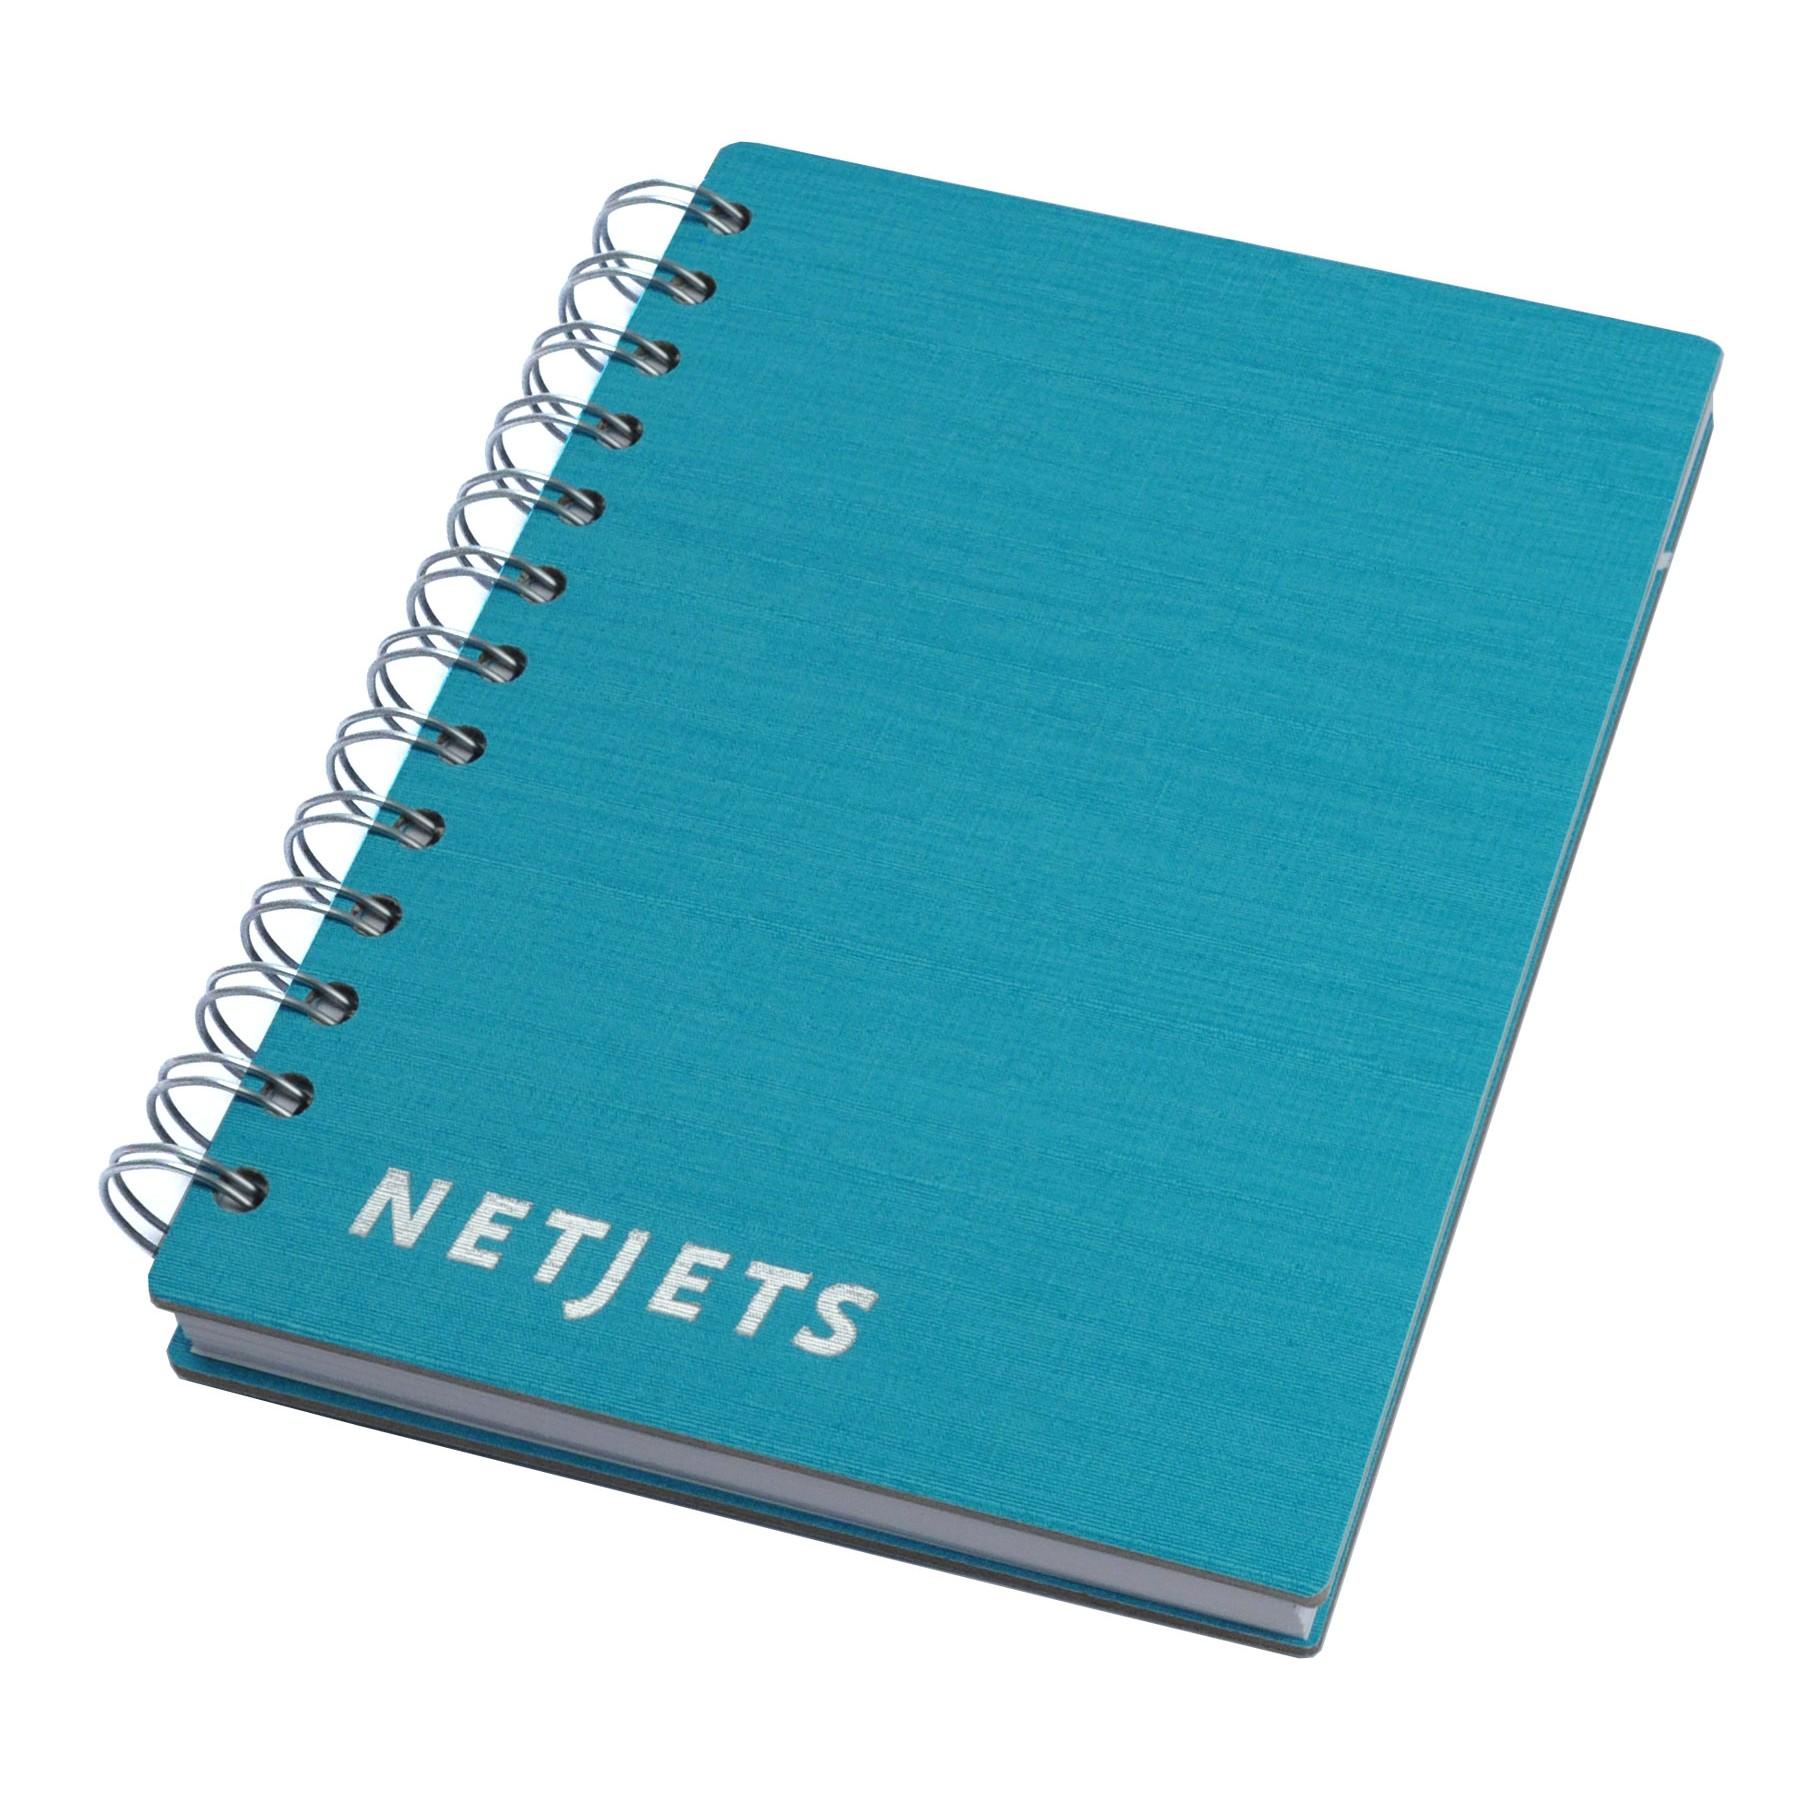 Boardroom Basics Spiral Journals w/ 100 Sheets 5″x7″ | Branded Journals